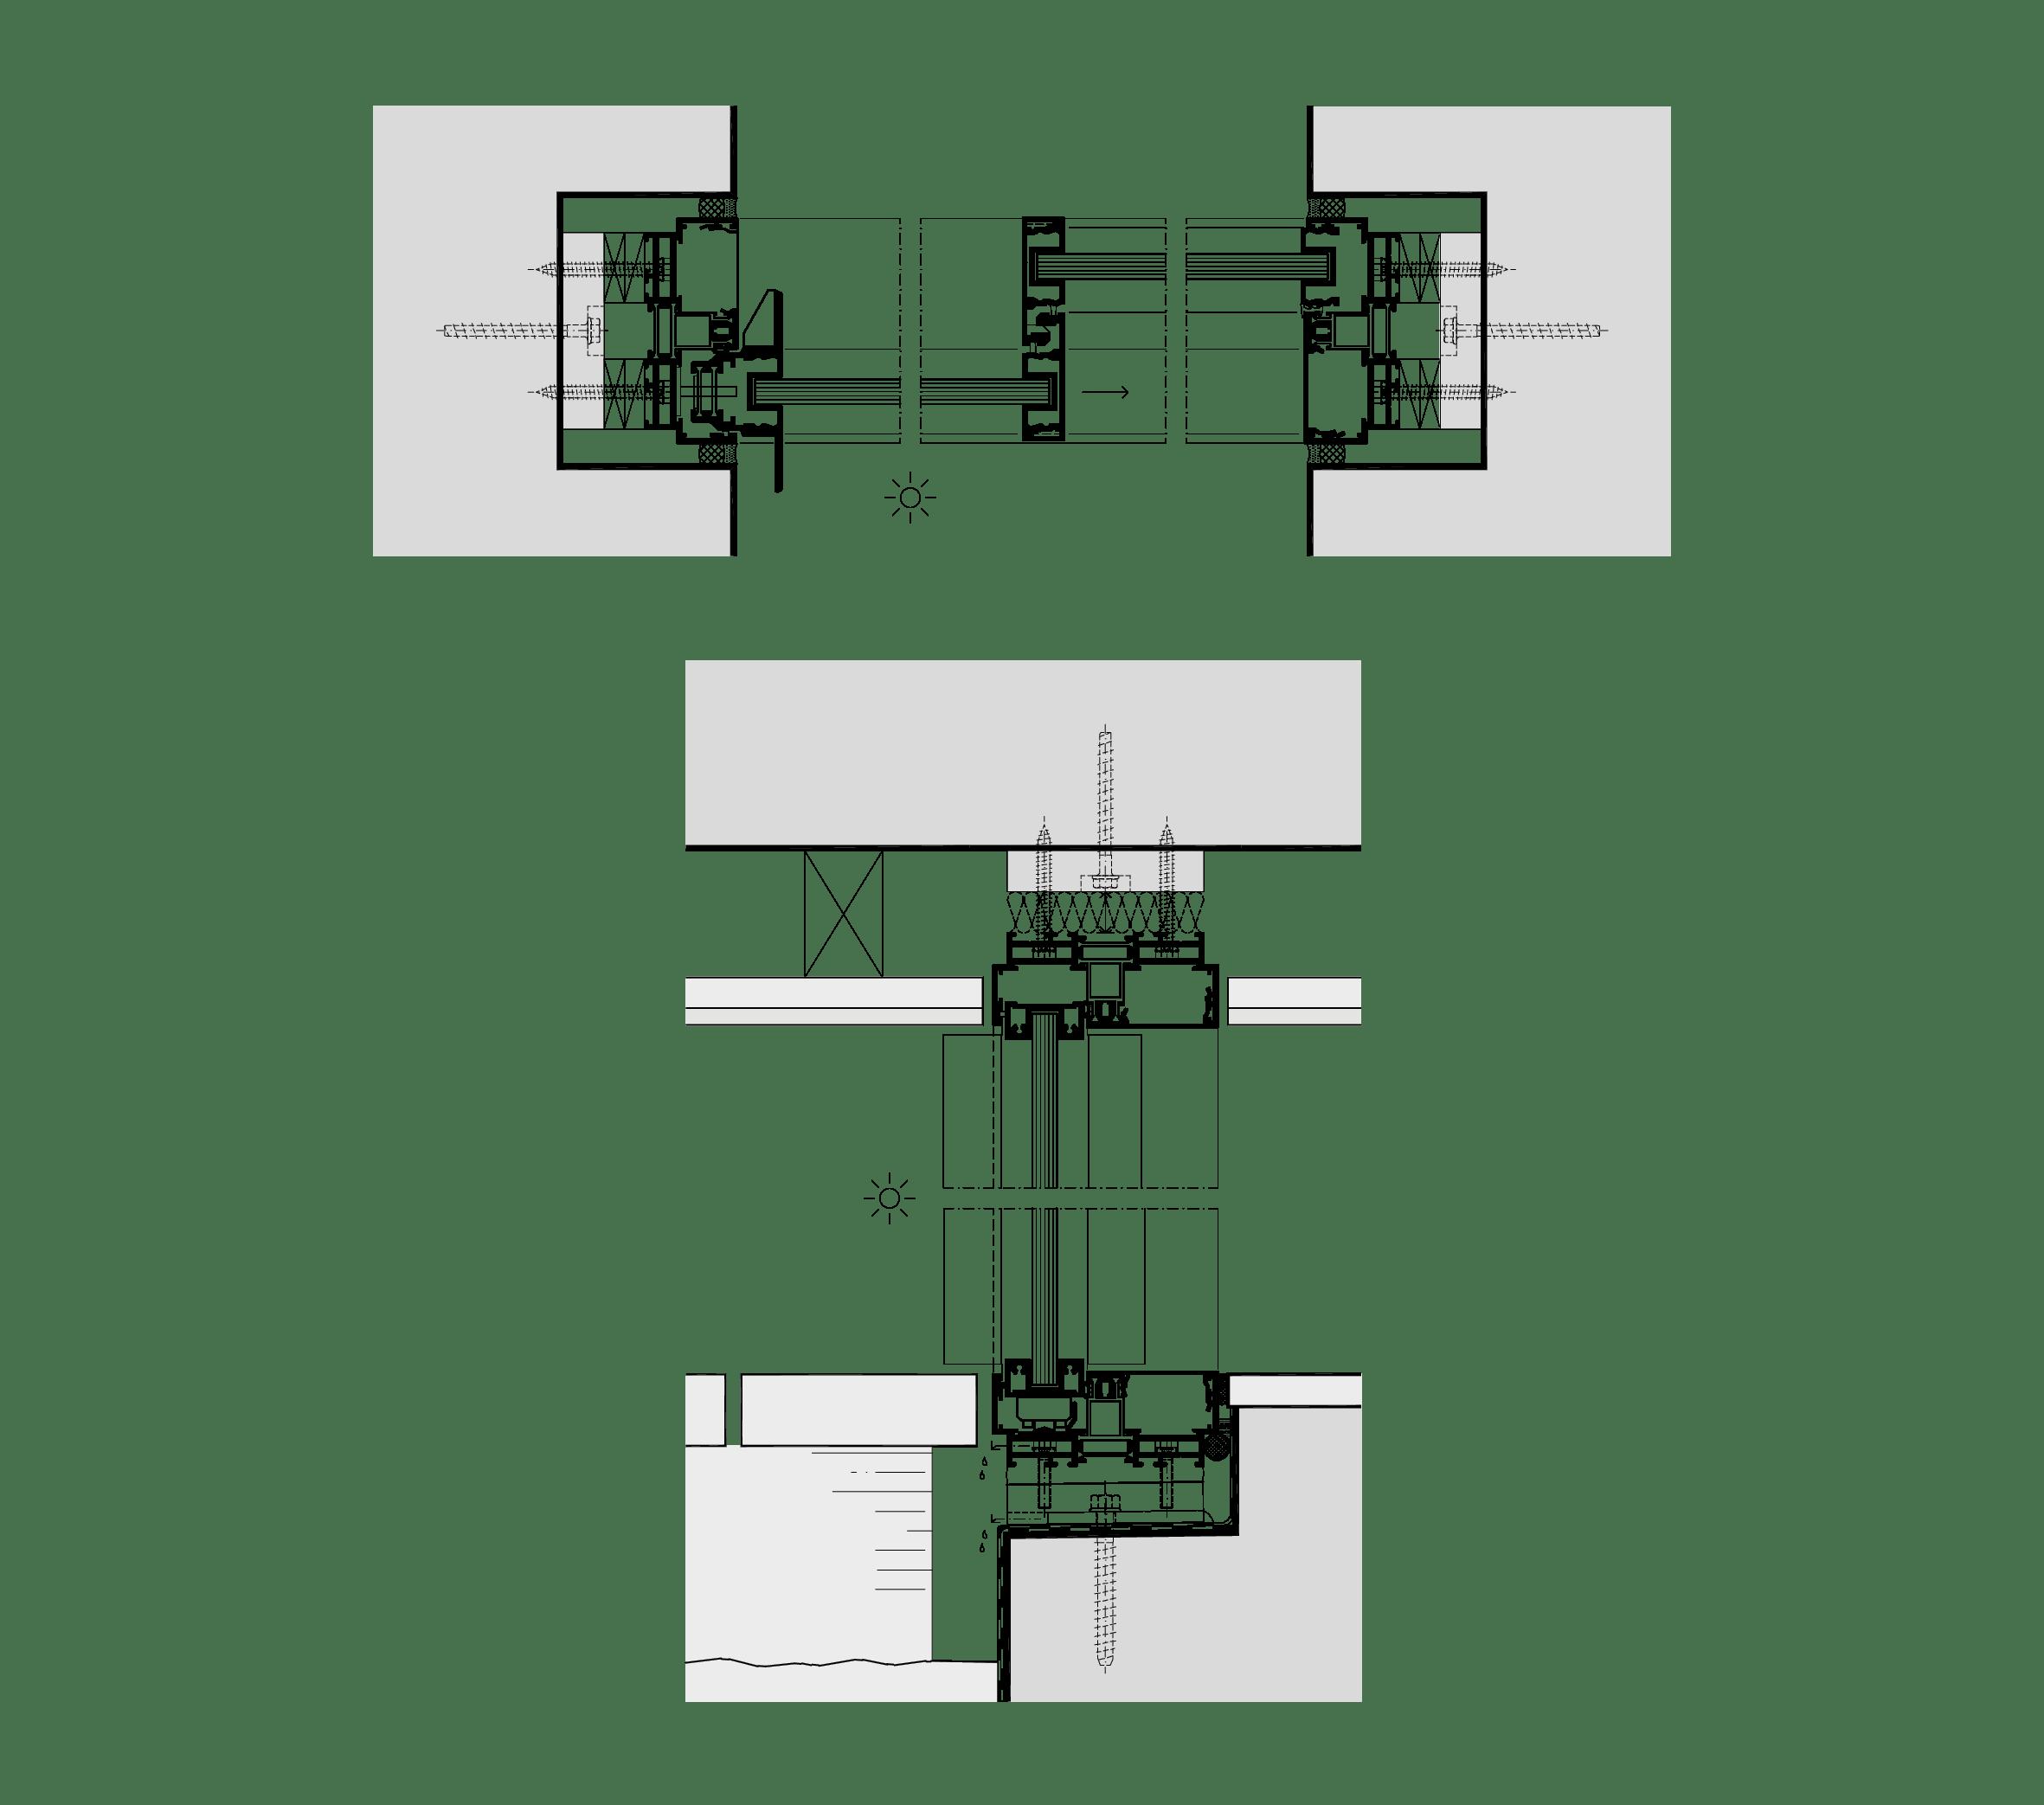 teknologi Technical Drawing Sky Frame 1.png 2362x2086 Q90 Subsampling 2